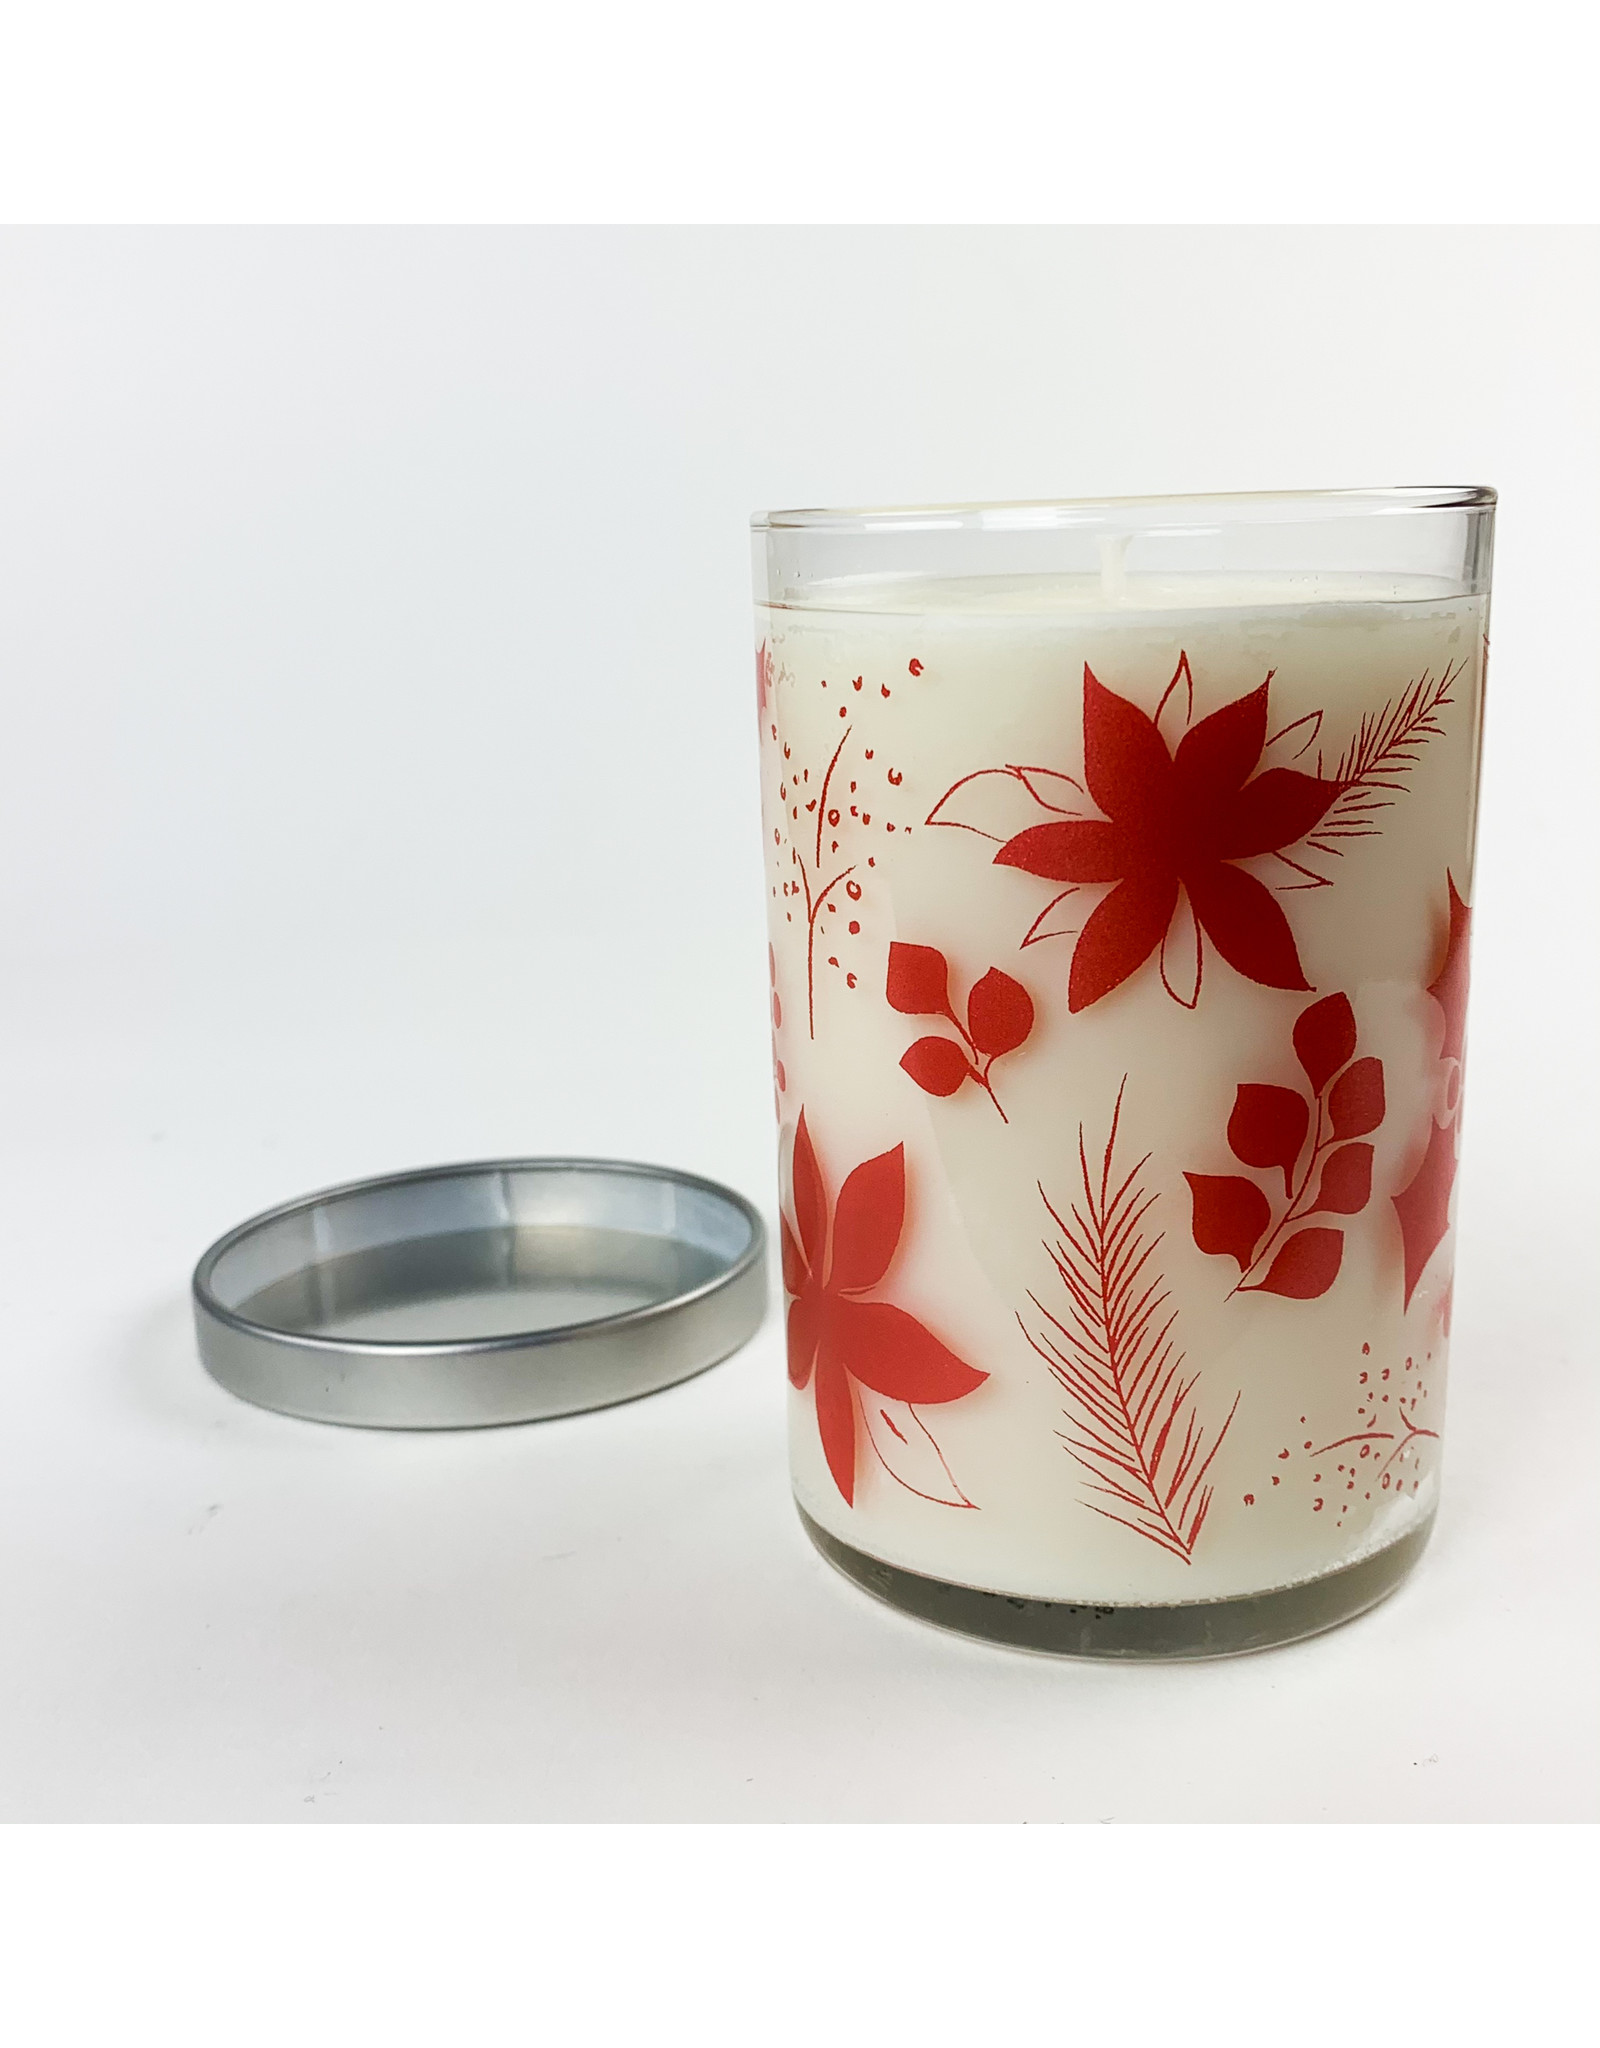 K. Hall Mistletoe screenprinted candle